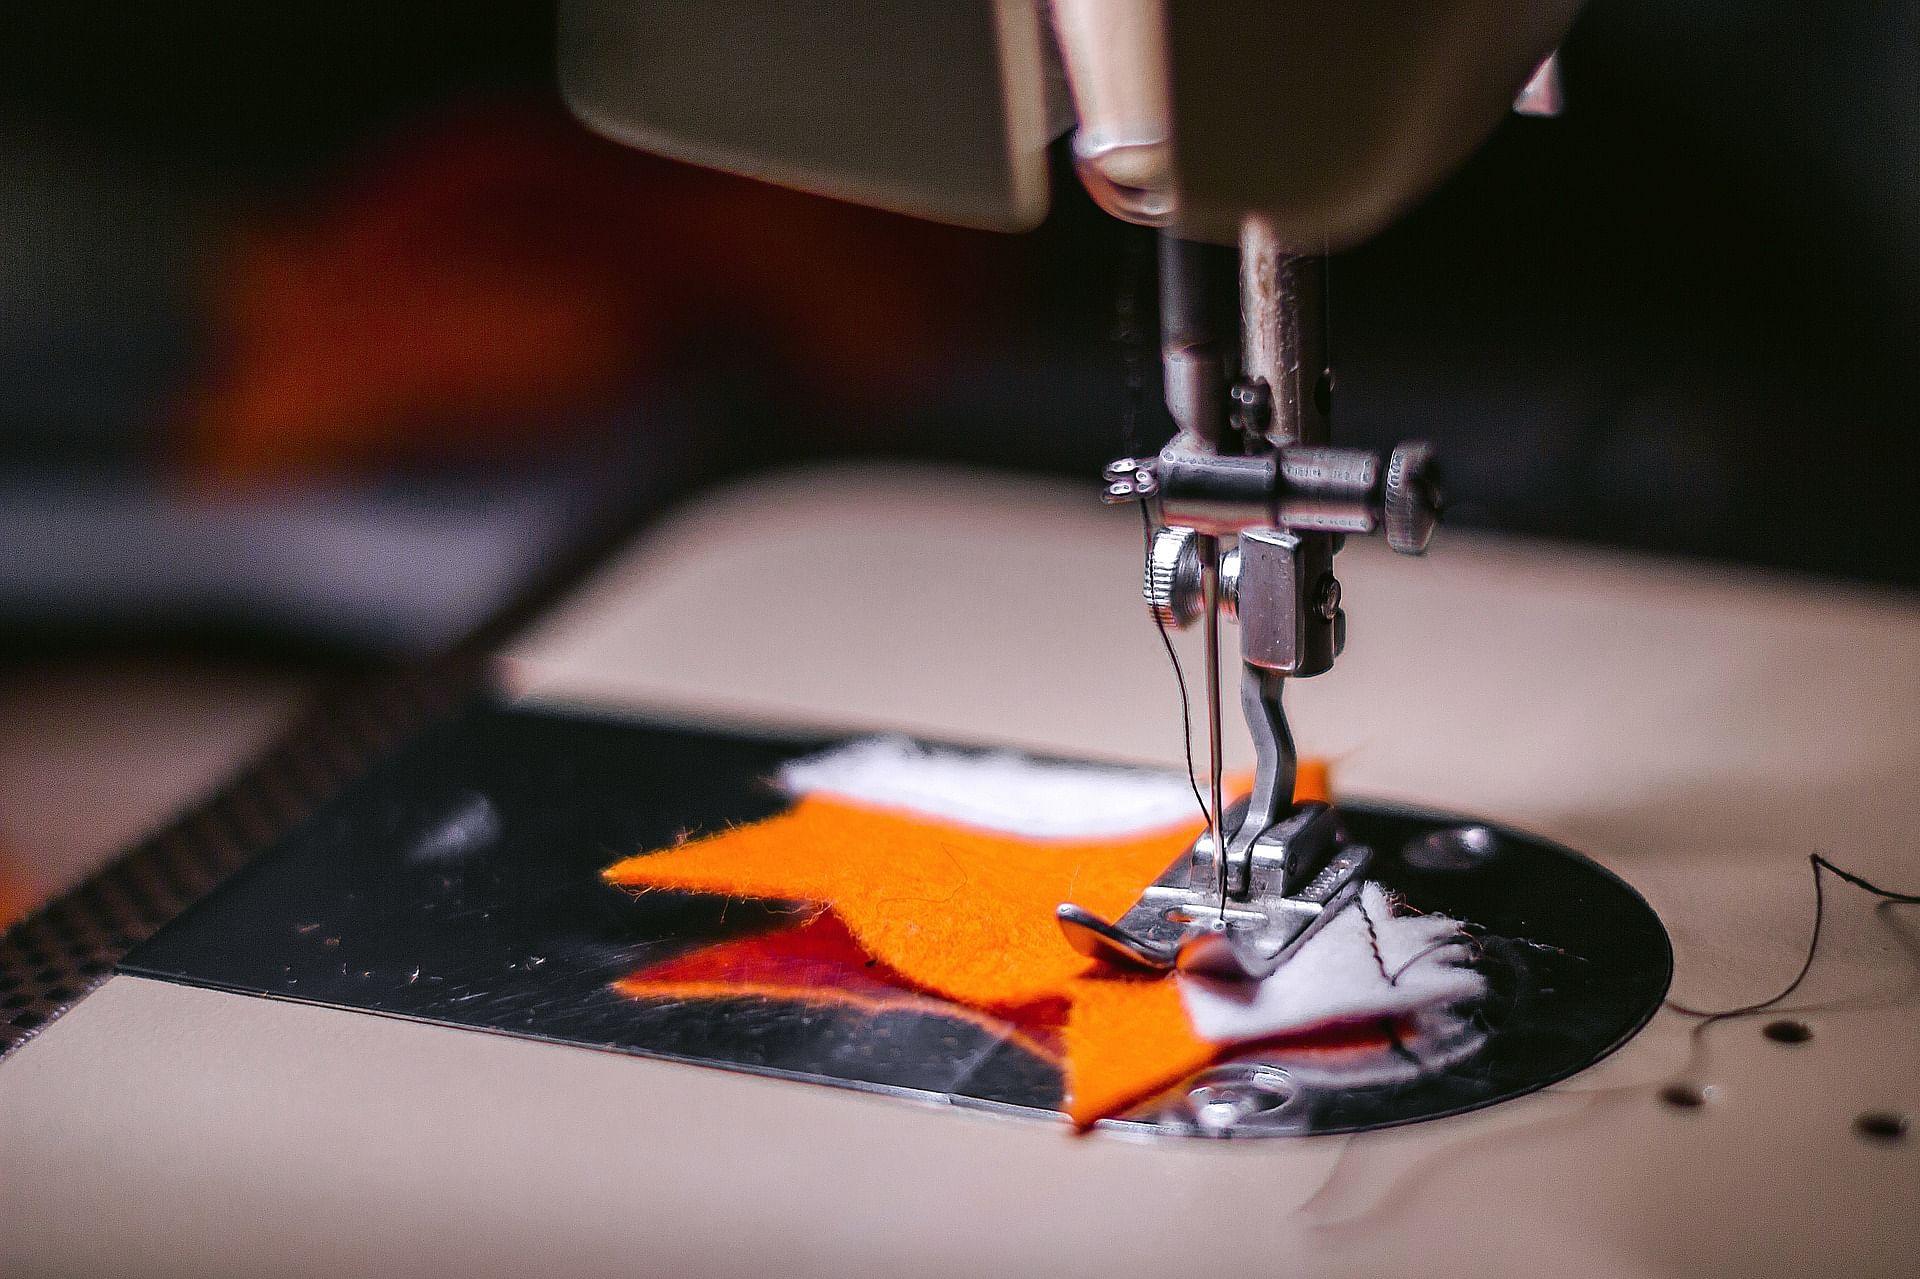 sewing-machine-925458_1920